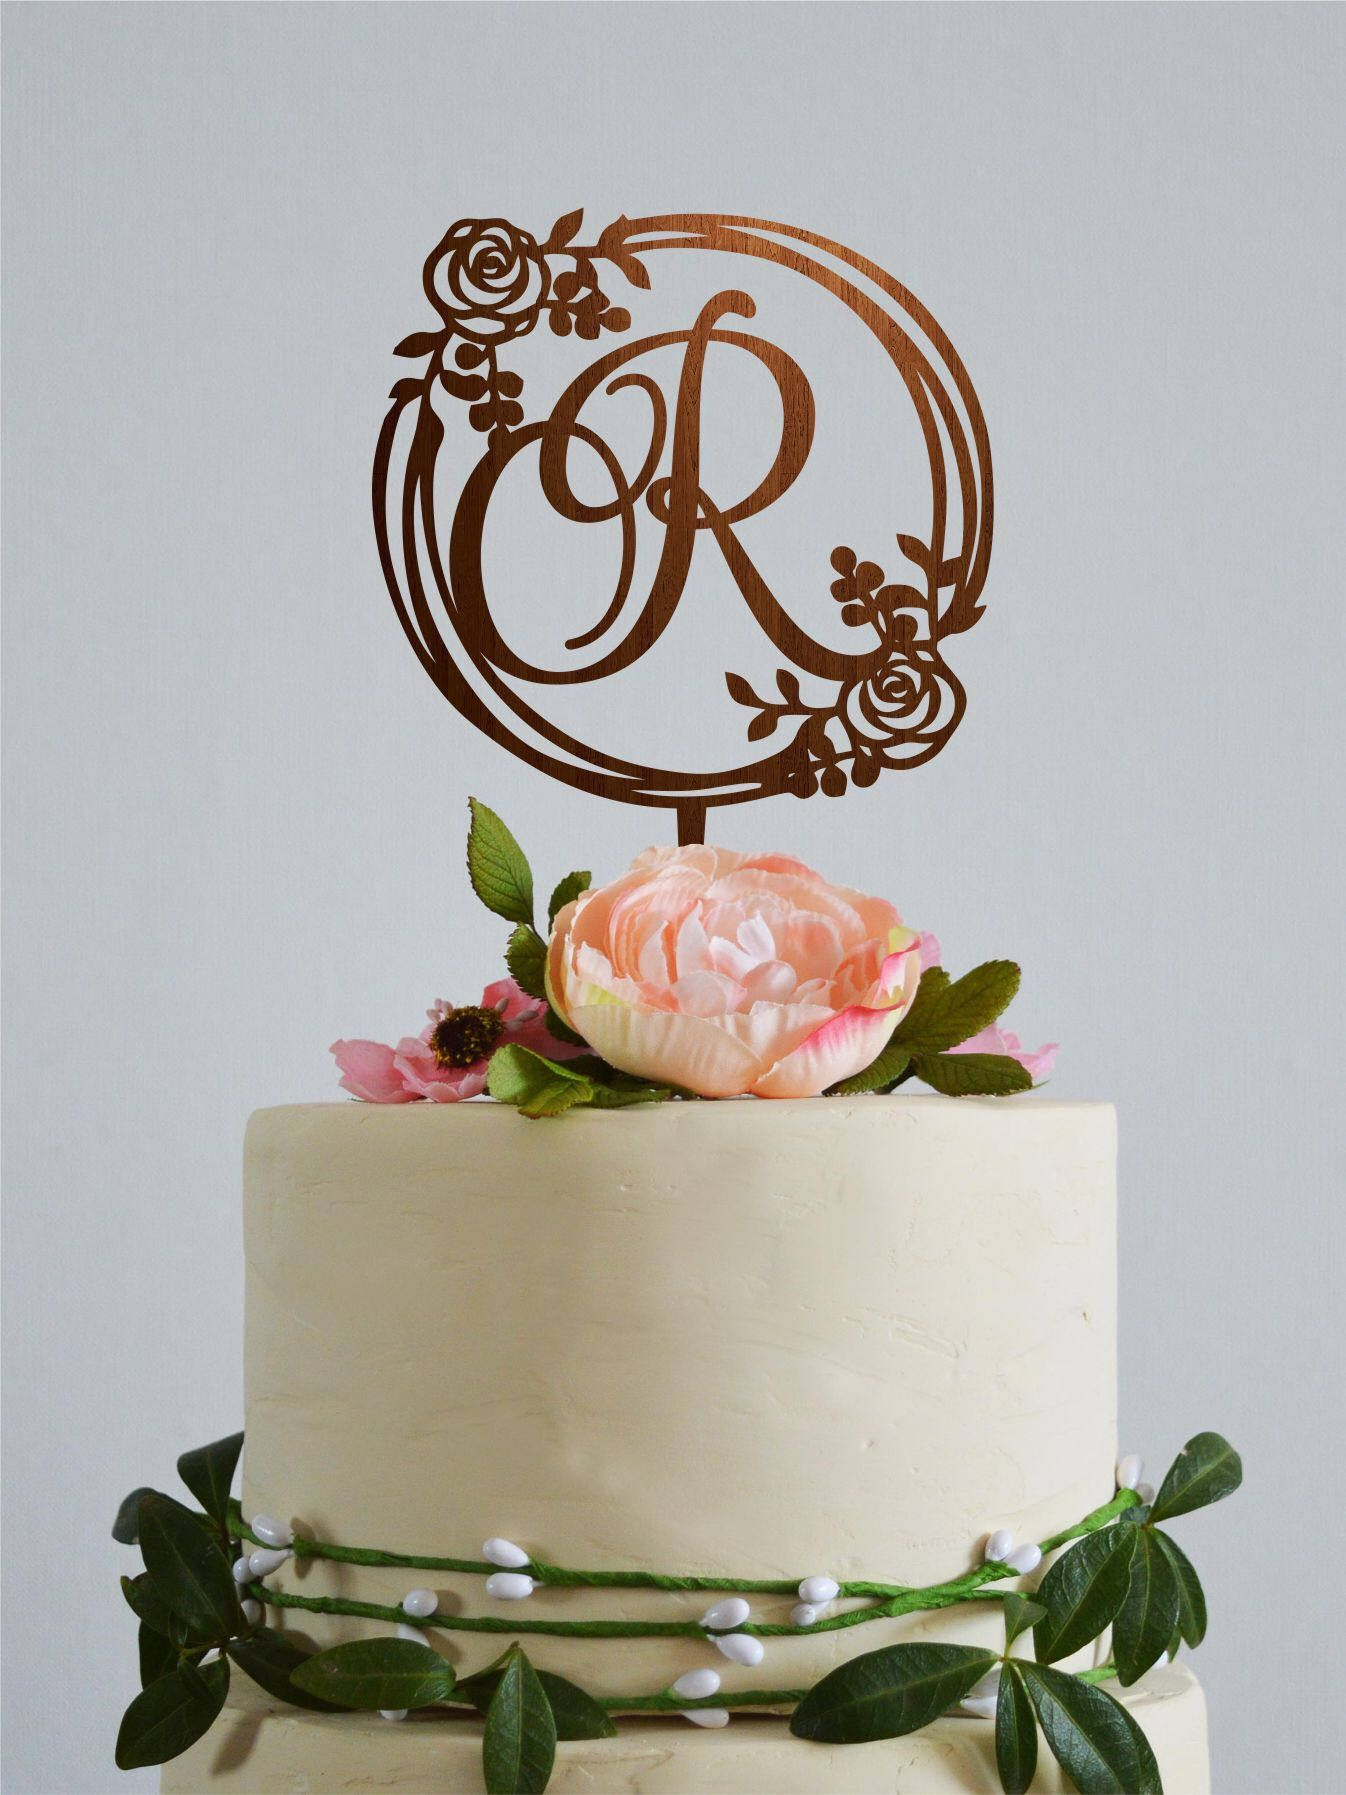 custom wording gold cake topper initials wedding cake topper Cake topper personalized